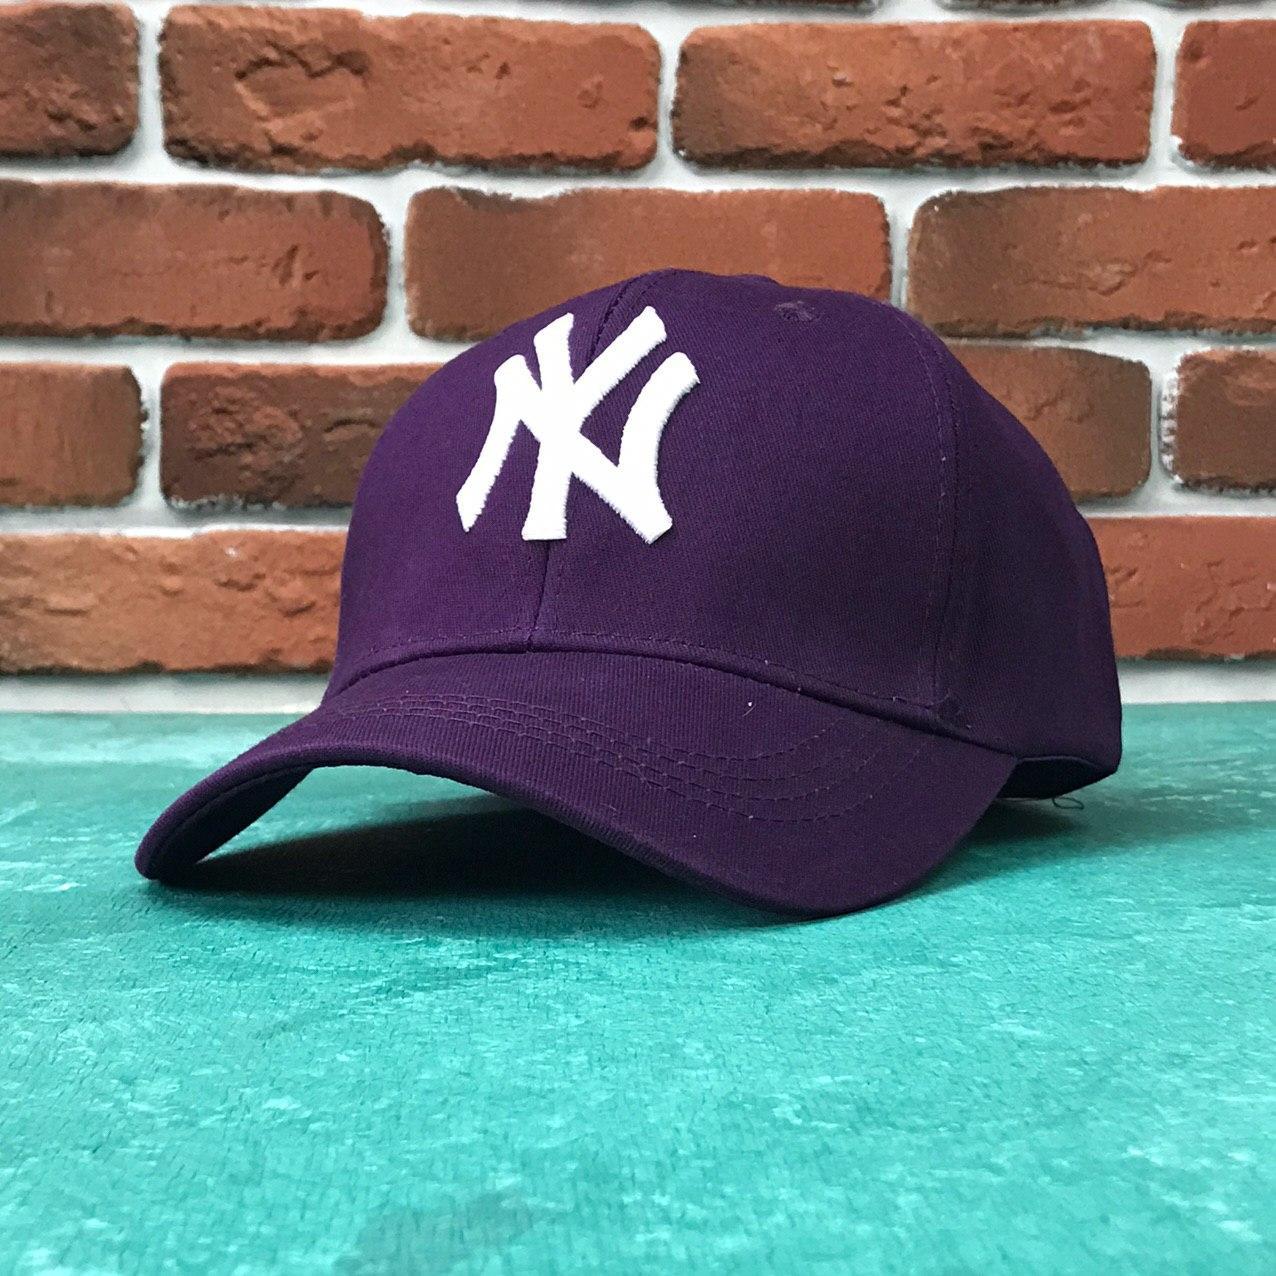 Кепка Бейсболка Мужская Женская MLB New York Yankees NY Фиолетовая с Белым лого